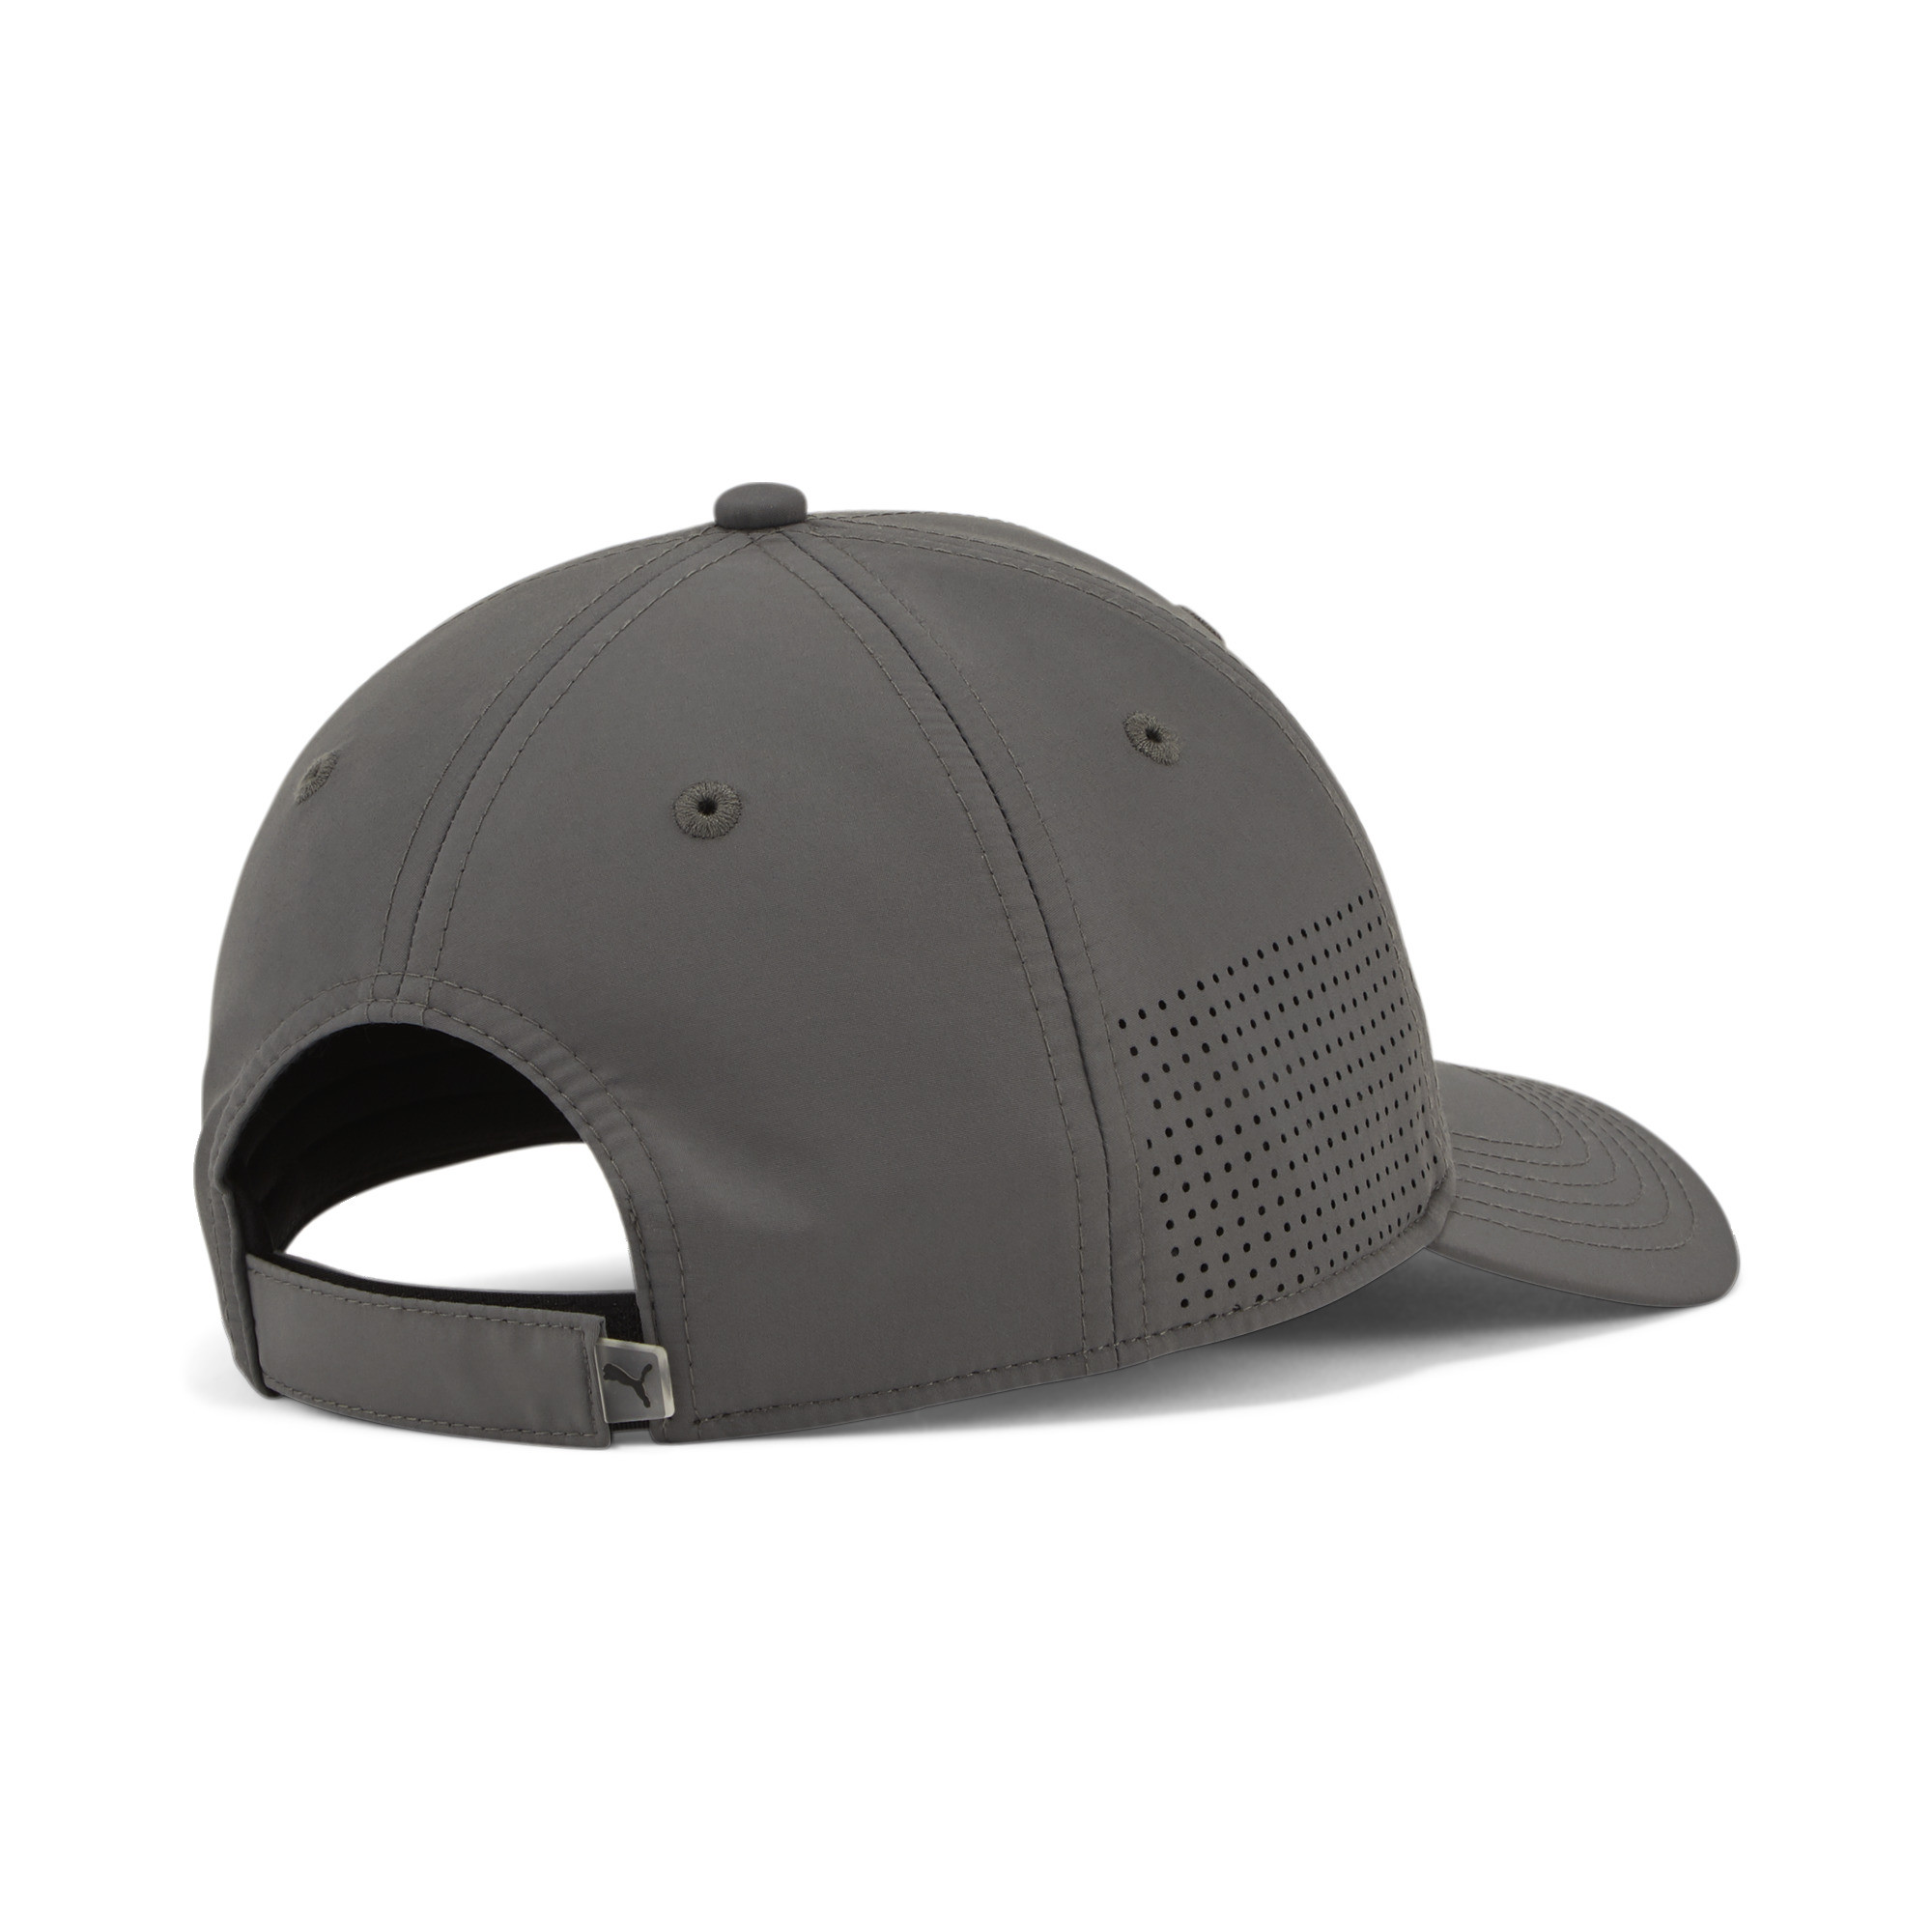 miniature 8 - Puma Men's Stream Perforated Adjustable Baseball Cap